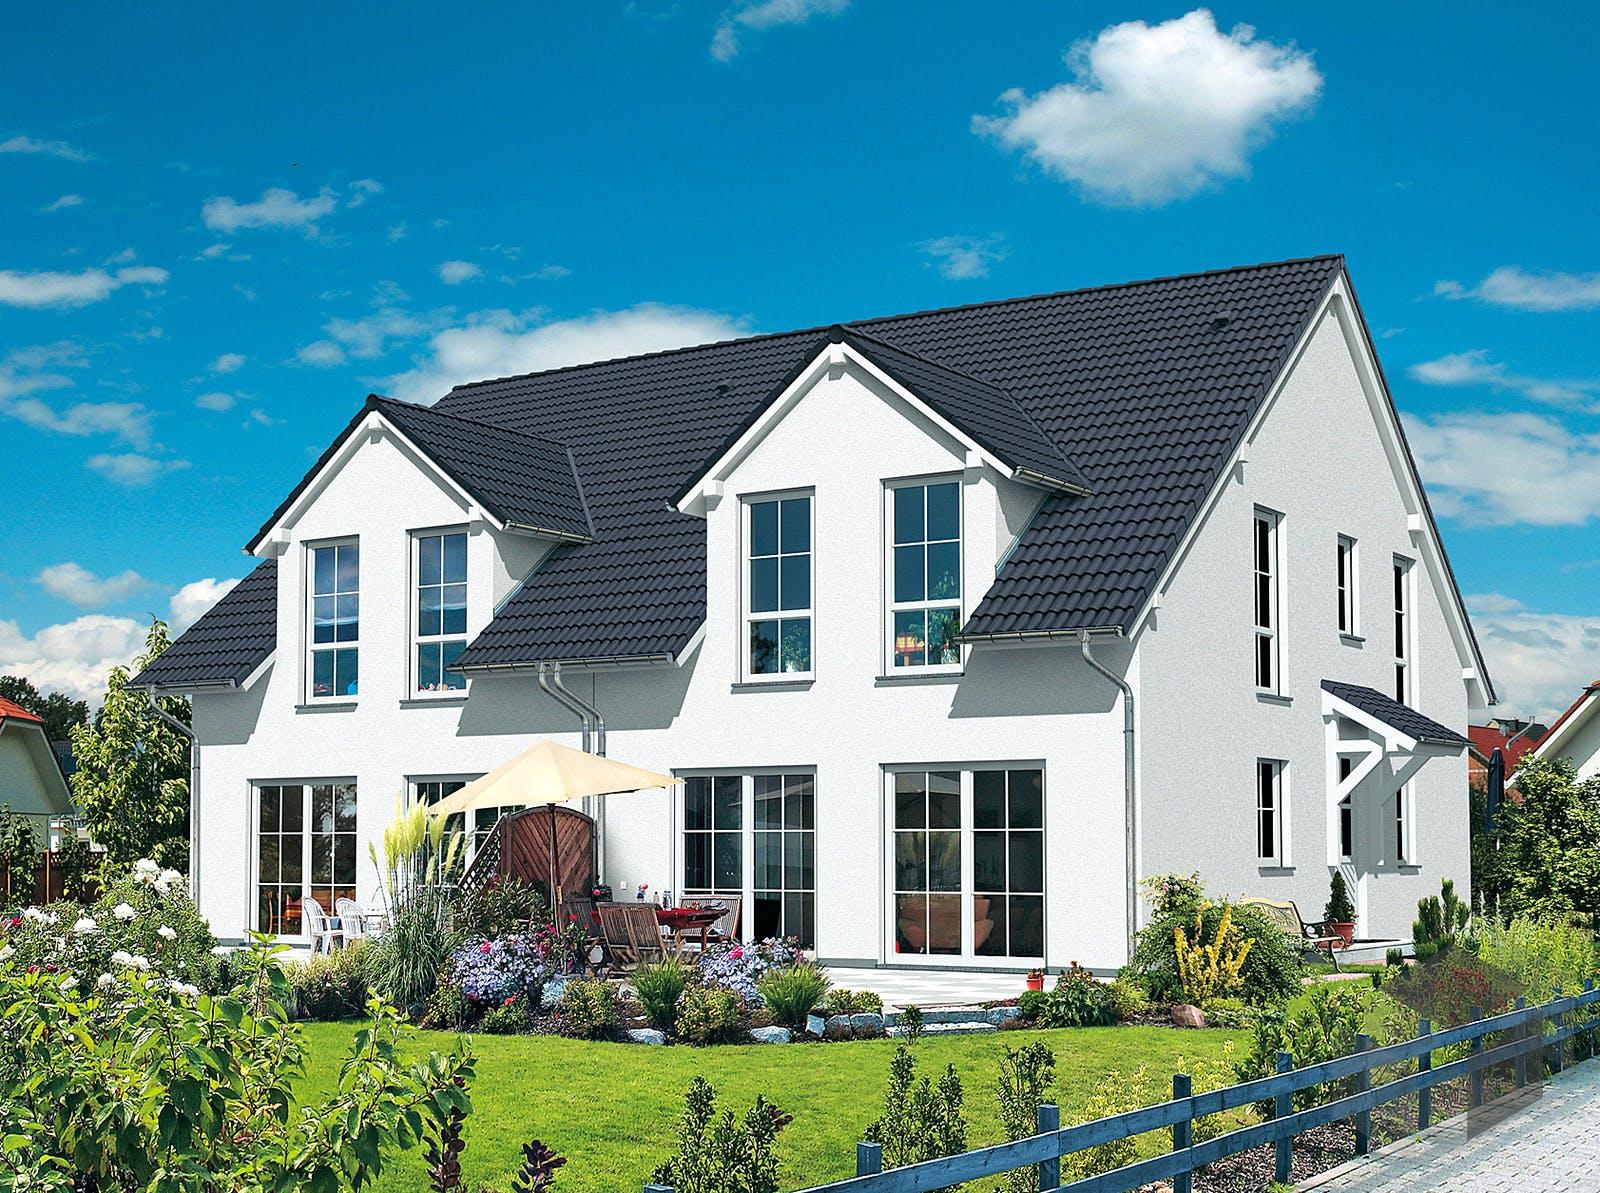 doppelhaus inactive von hefa holz massivhaus komplette daten bersicht. Black Bedroom Furniture Sets. Home Design Ideas